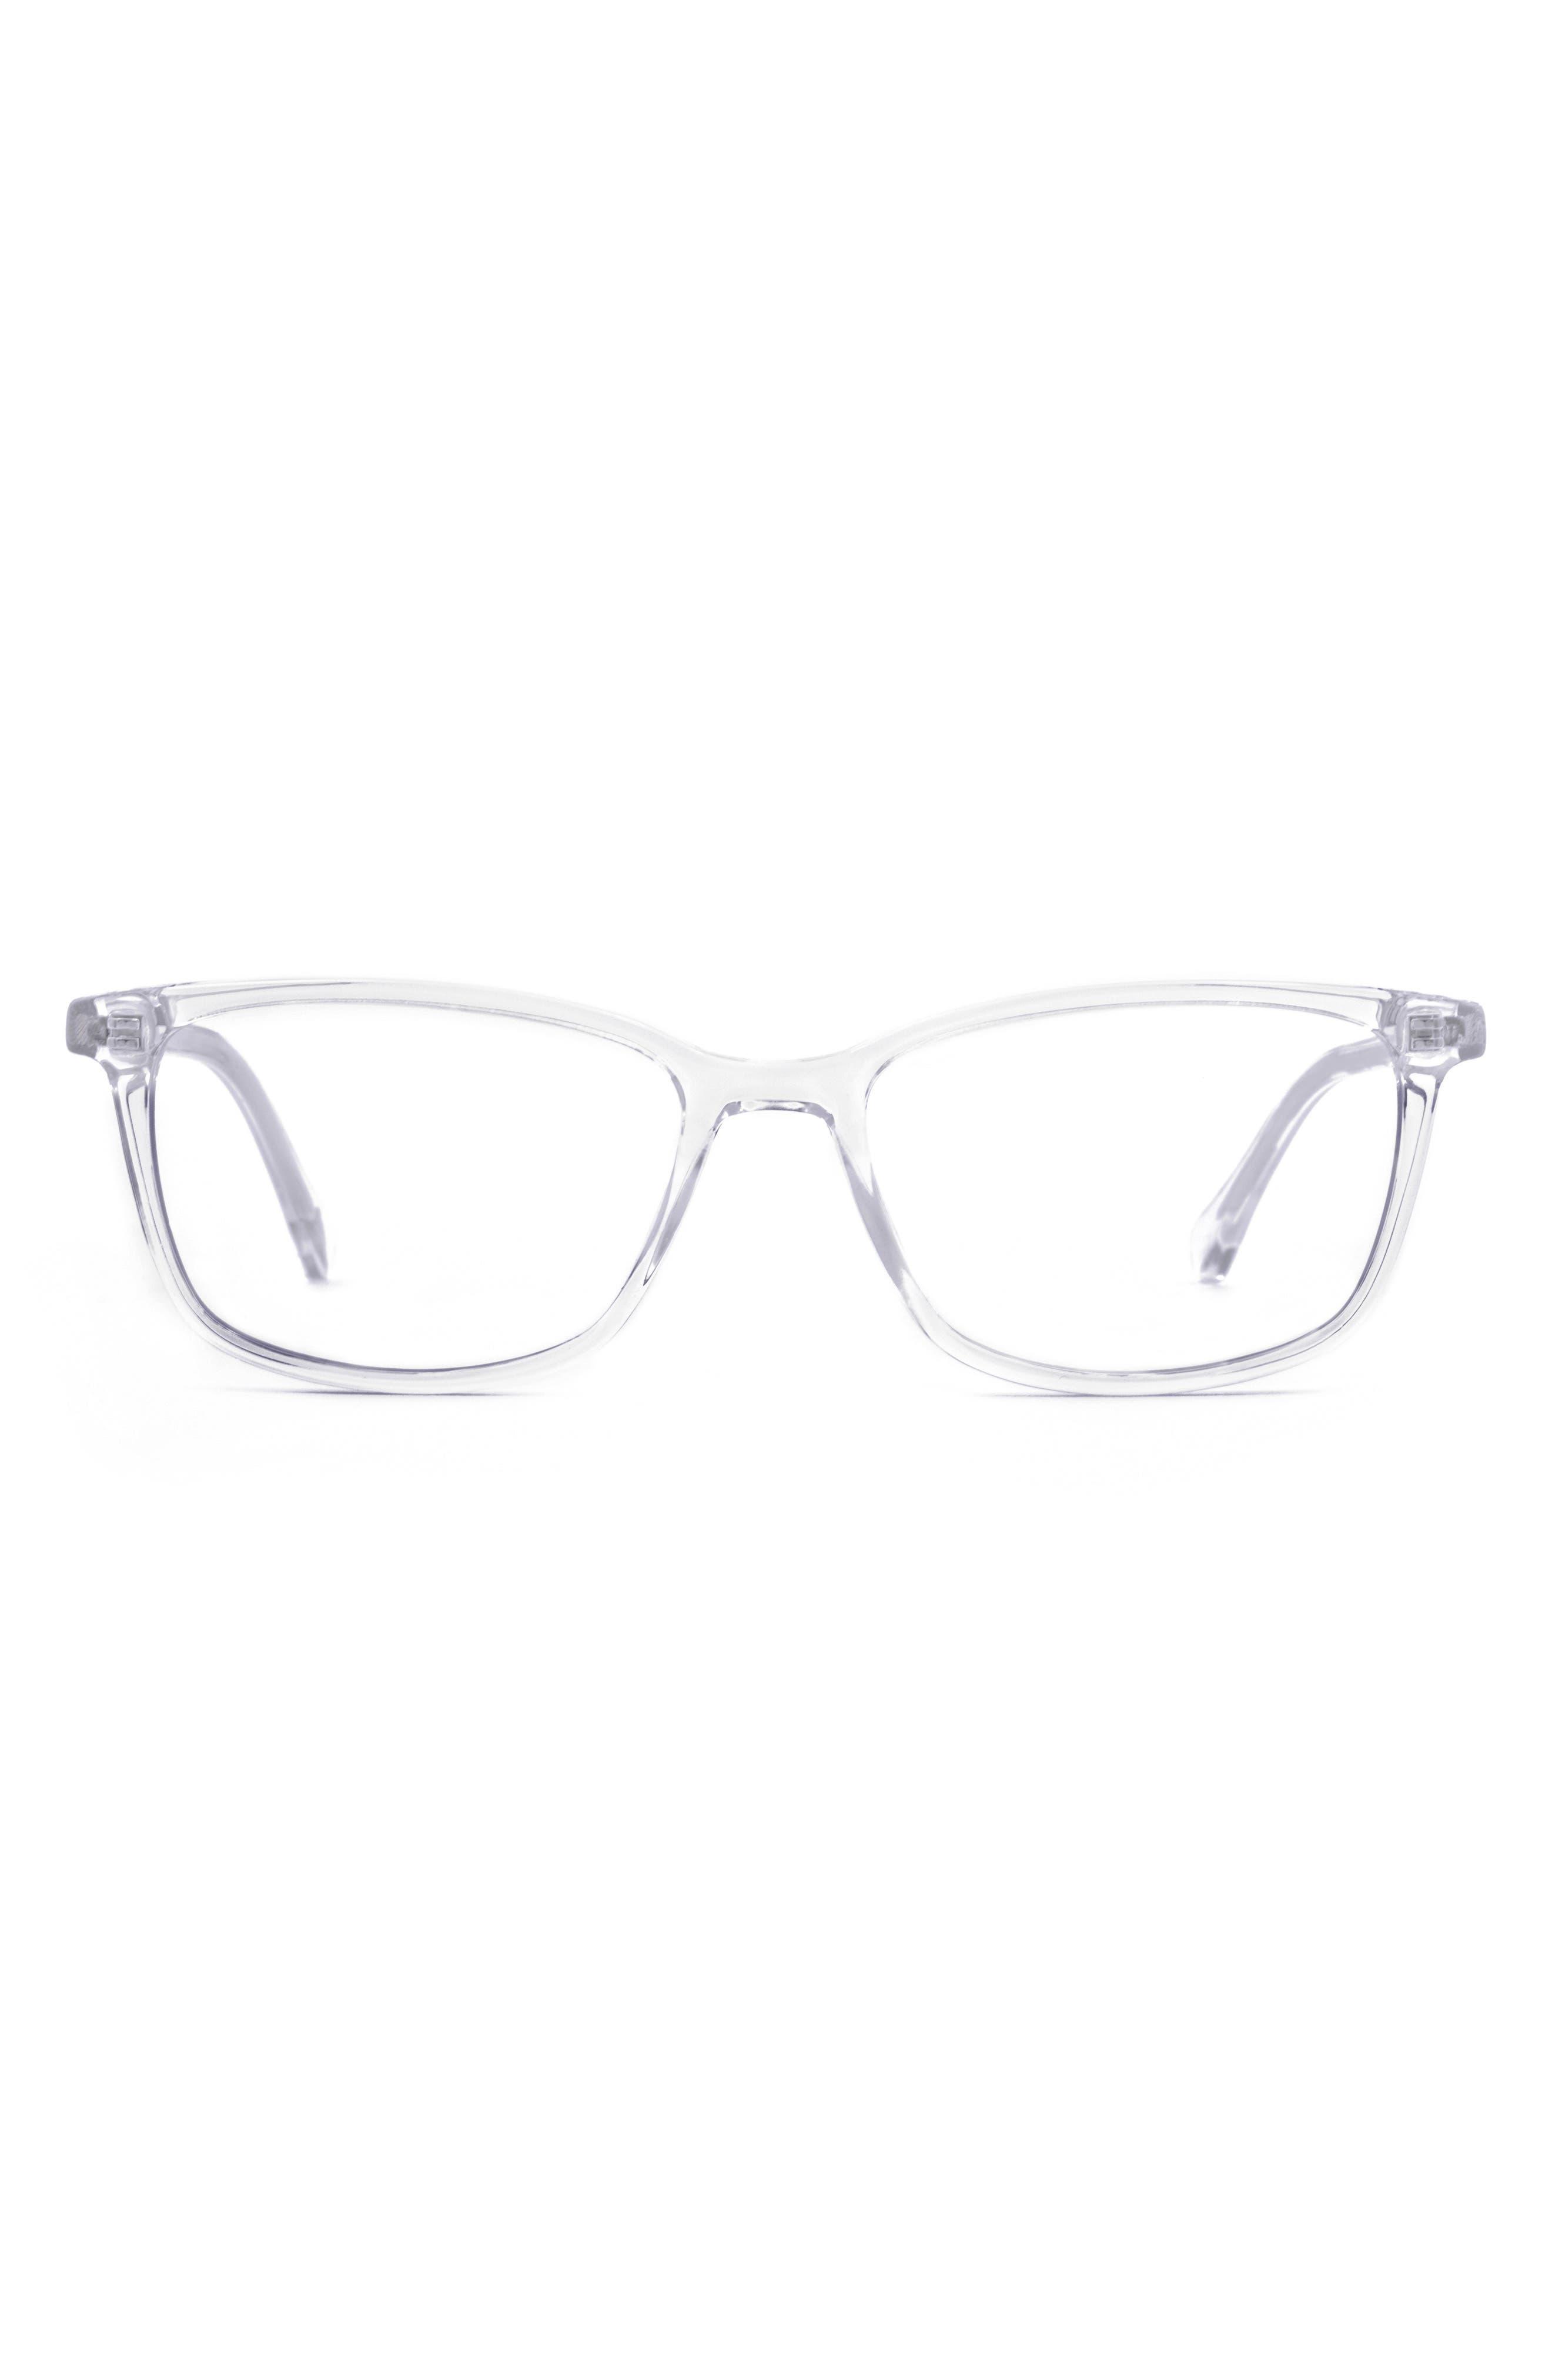 Faraday 53mm Rectangle Blue Light Blocking Glasses